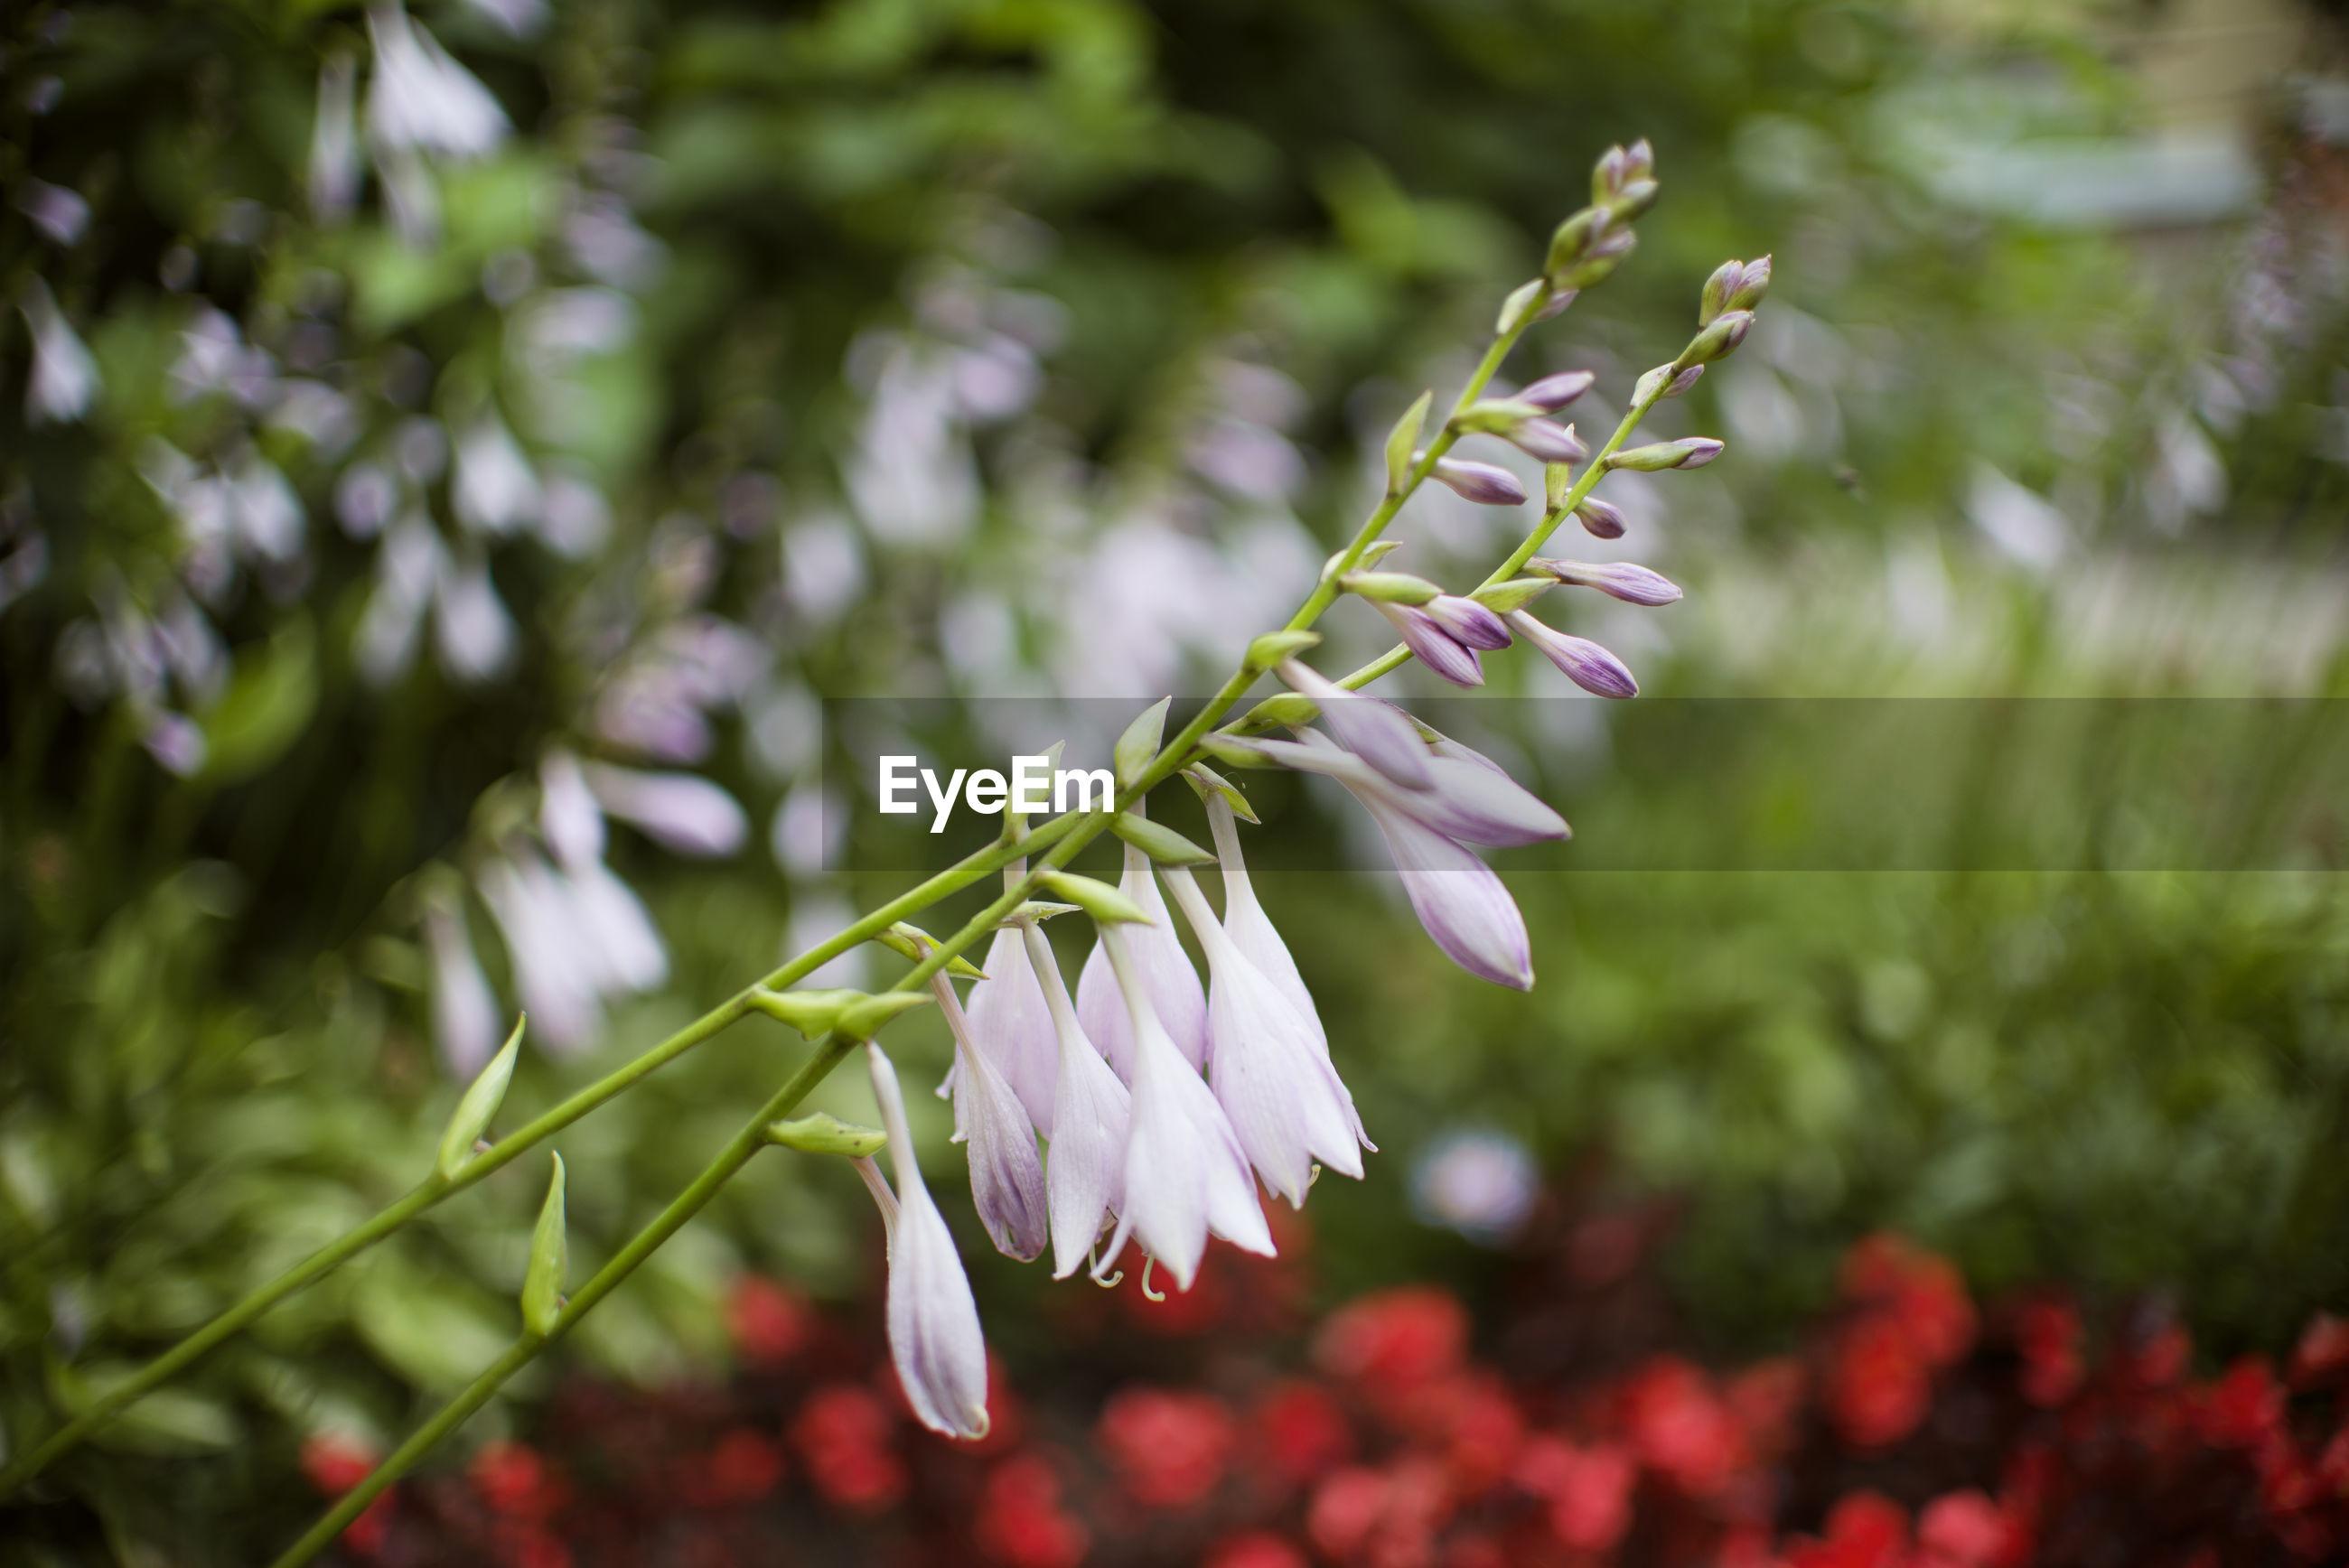 CLOSE-UP OF PURPLE FLOWER PLANT